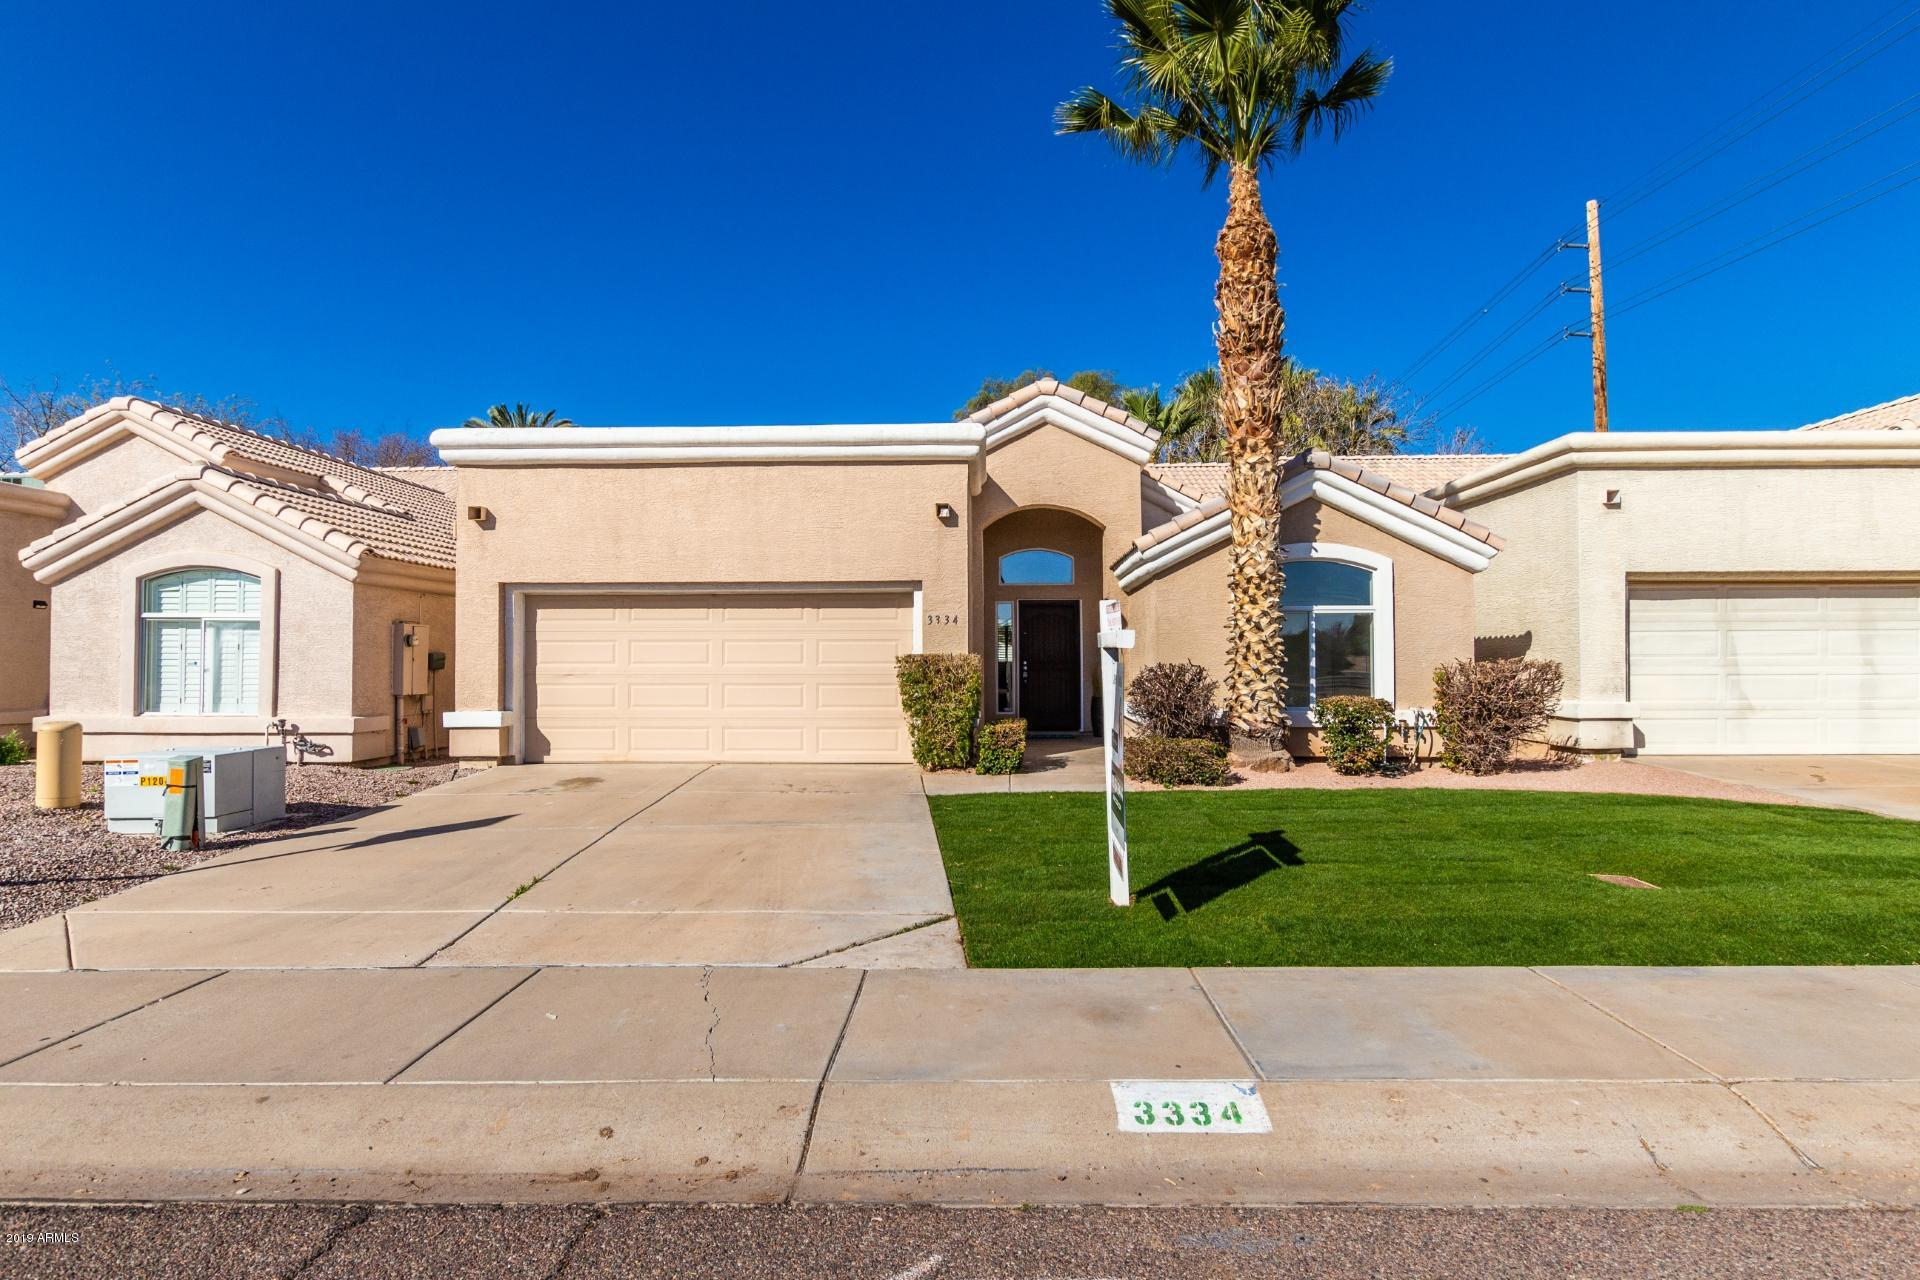 Photo of 3334 N 42ND Street, Phoenix, AZ 85018